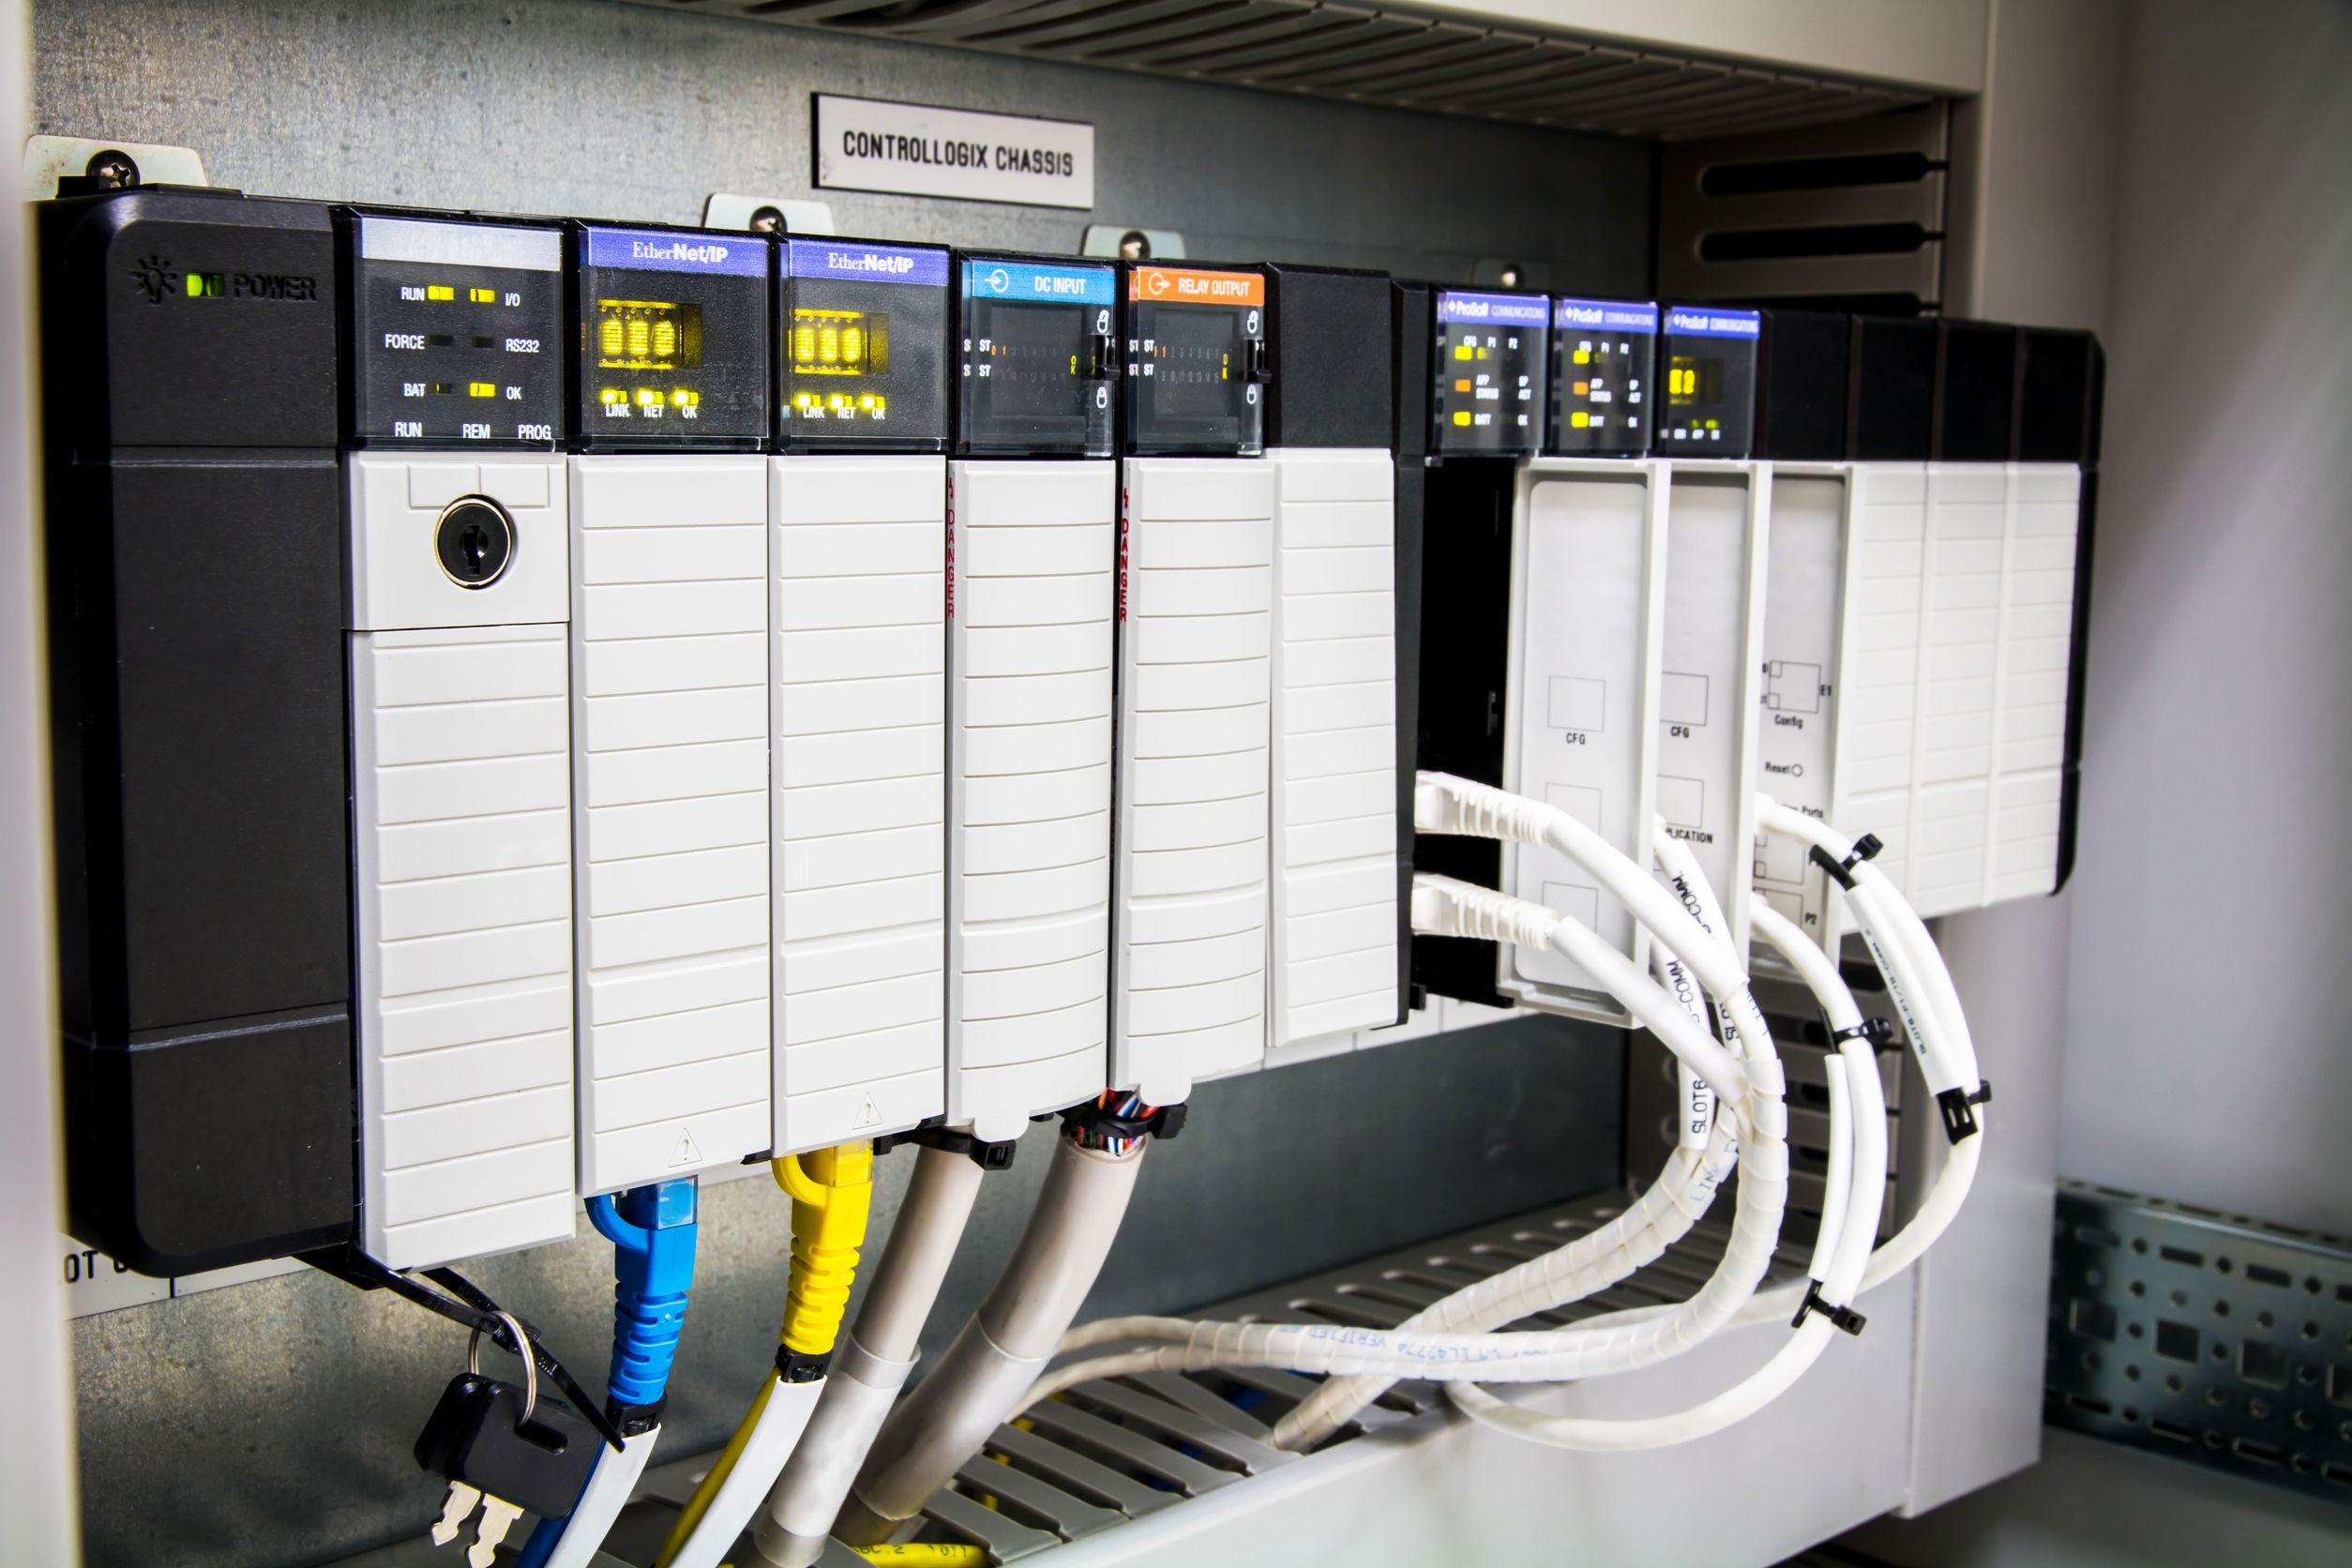 PLC programable logic controler promoting plc training courses